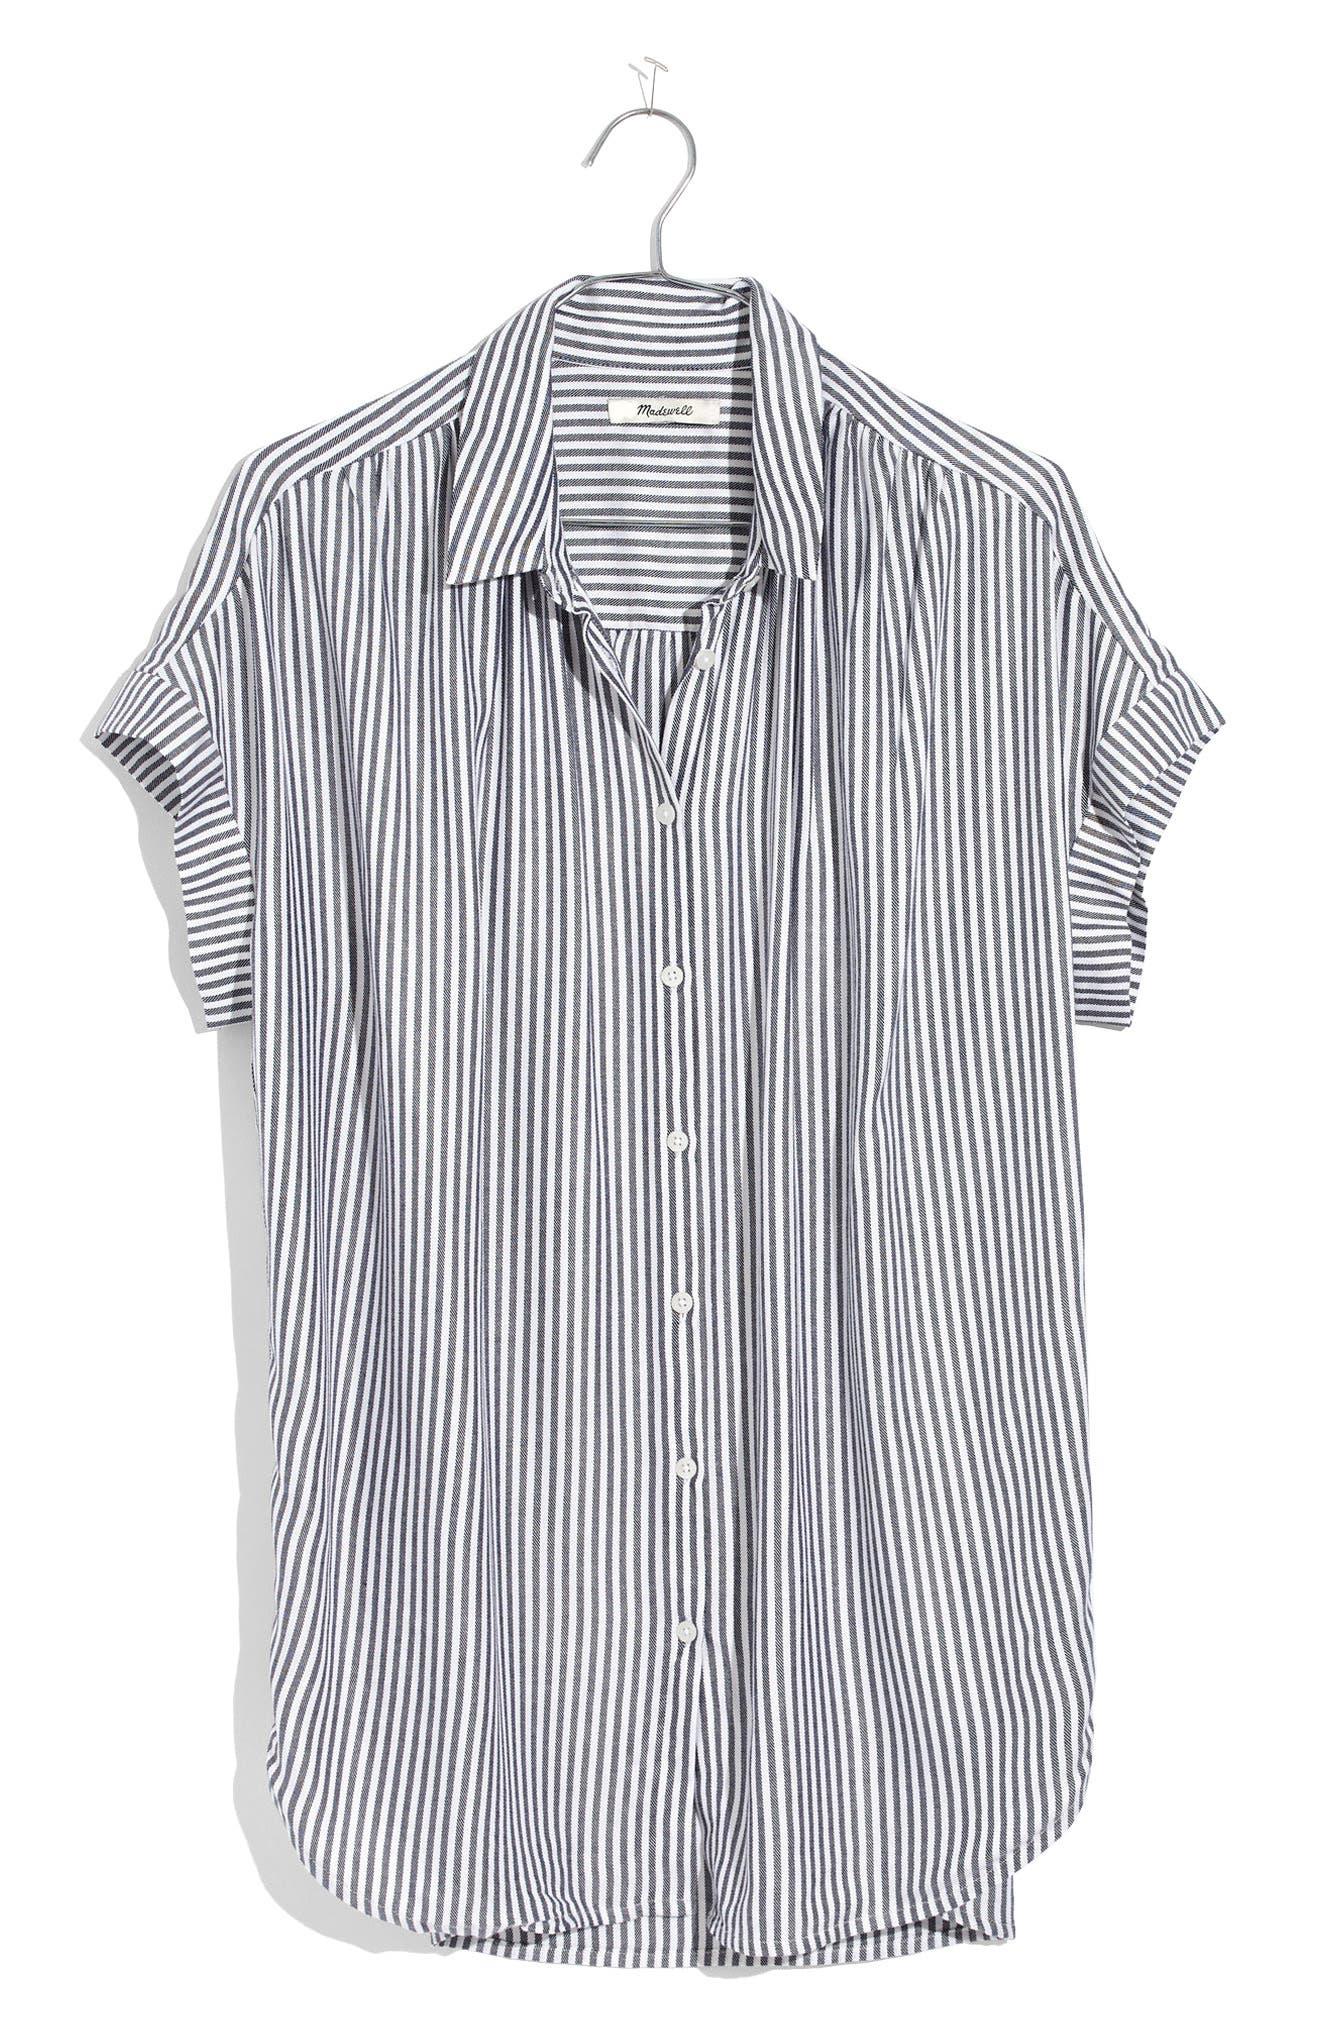 Central Stripe Shirt,                         Main,                         color, Navy/ Ivory Stripe